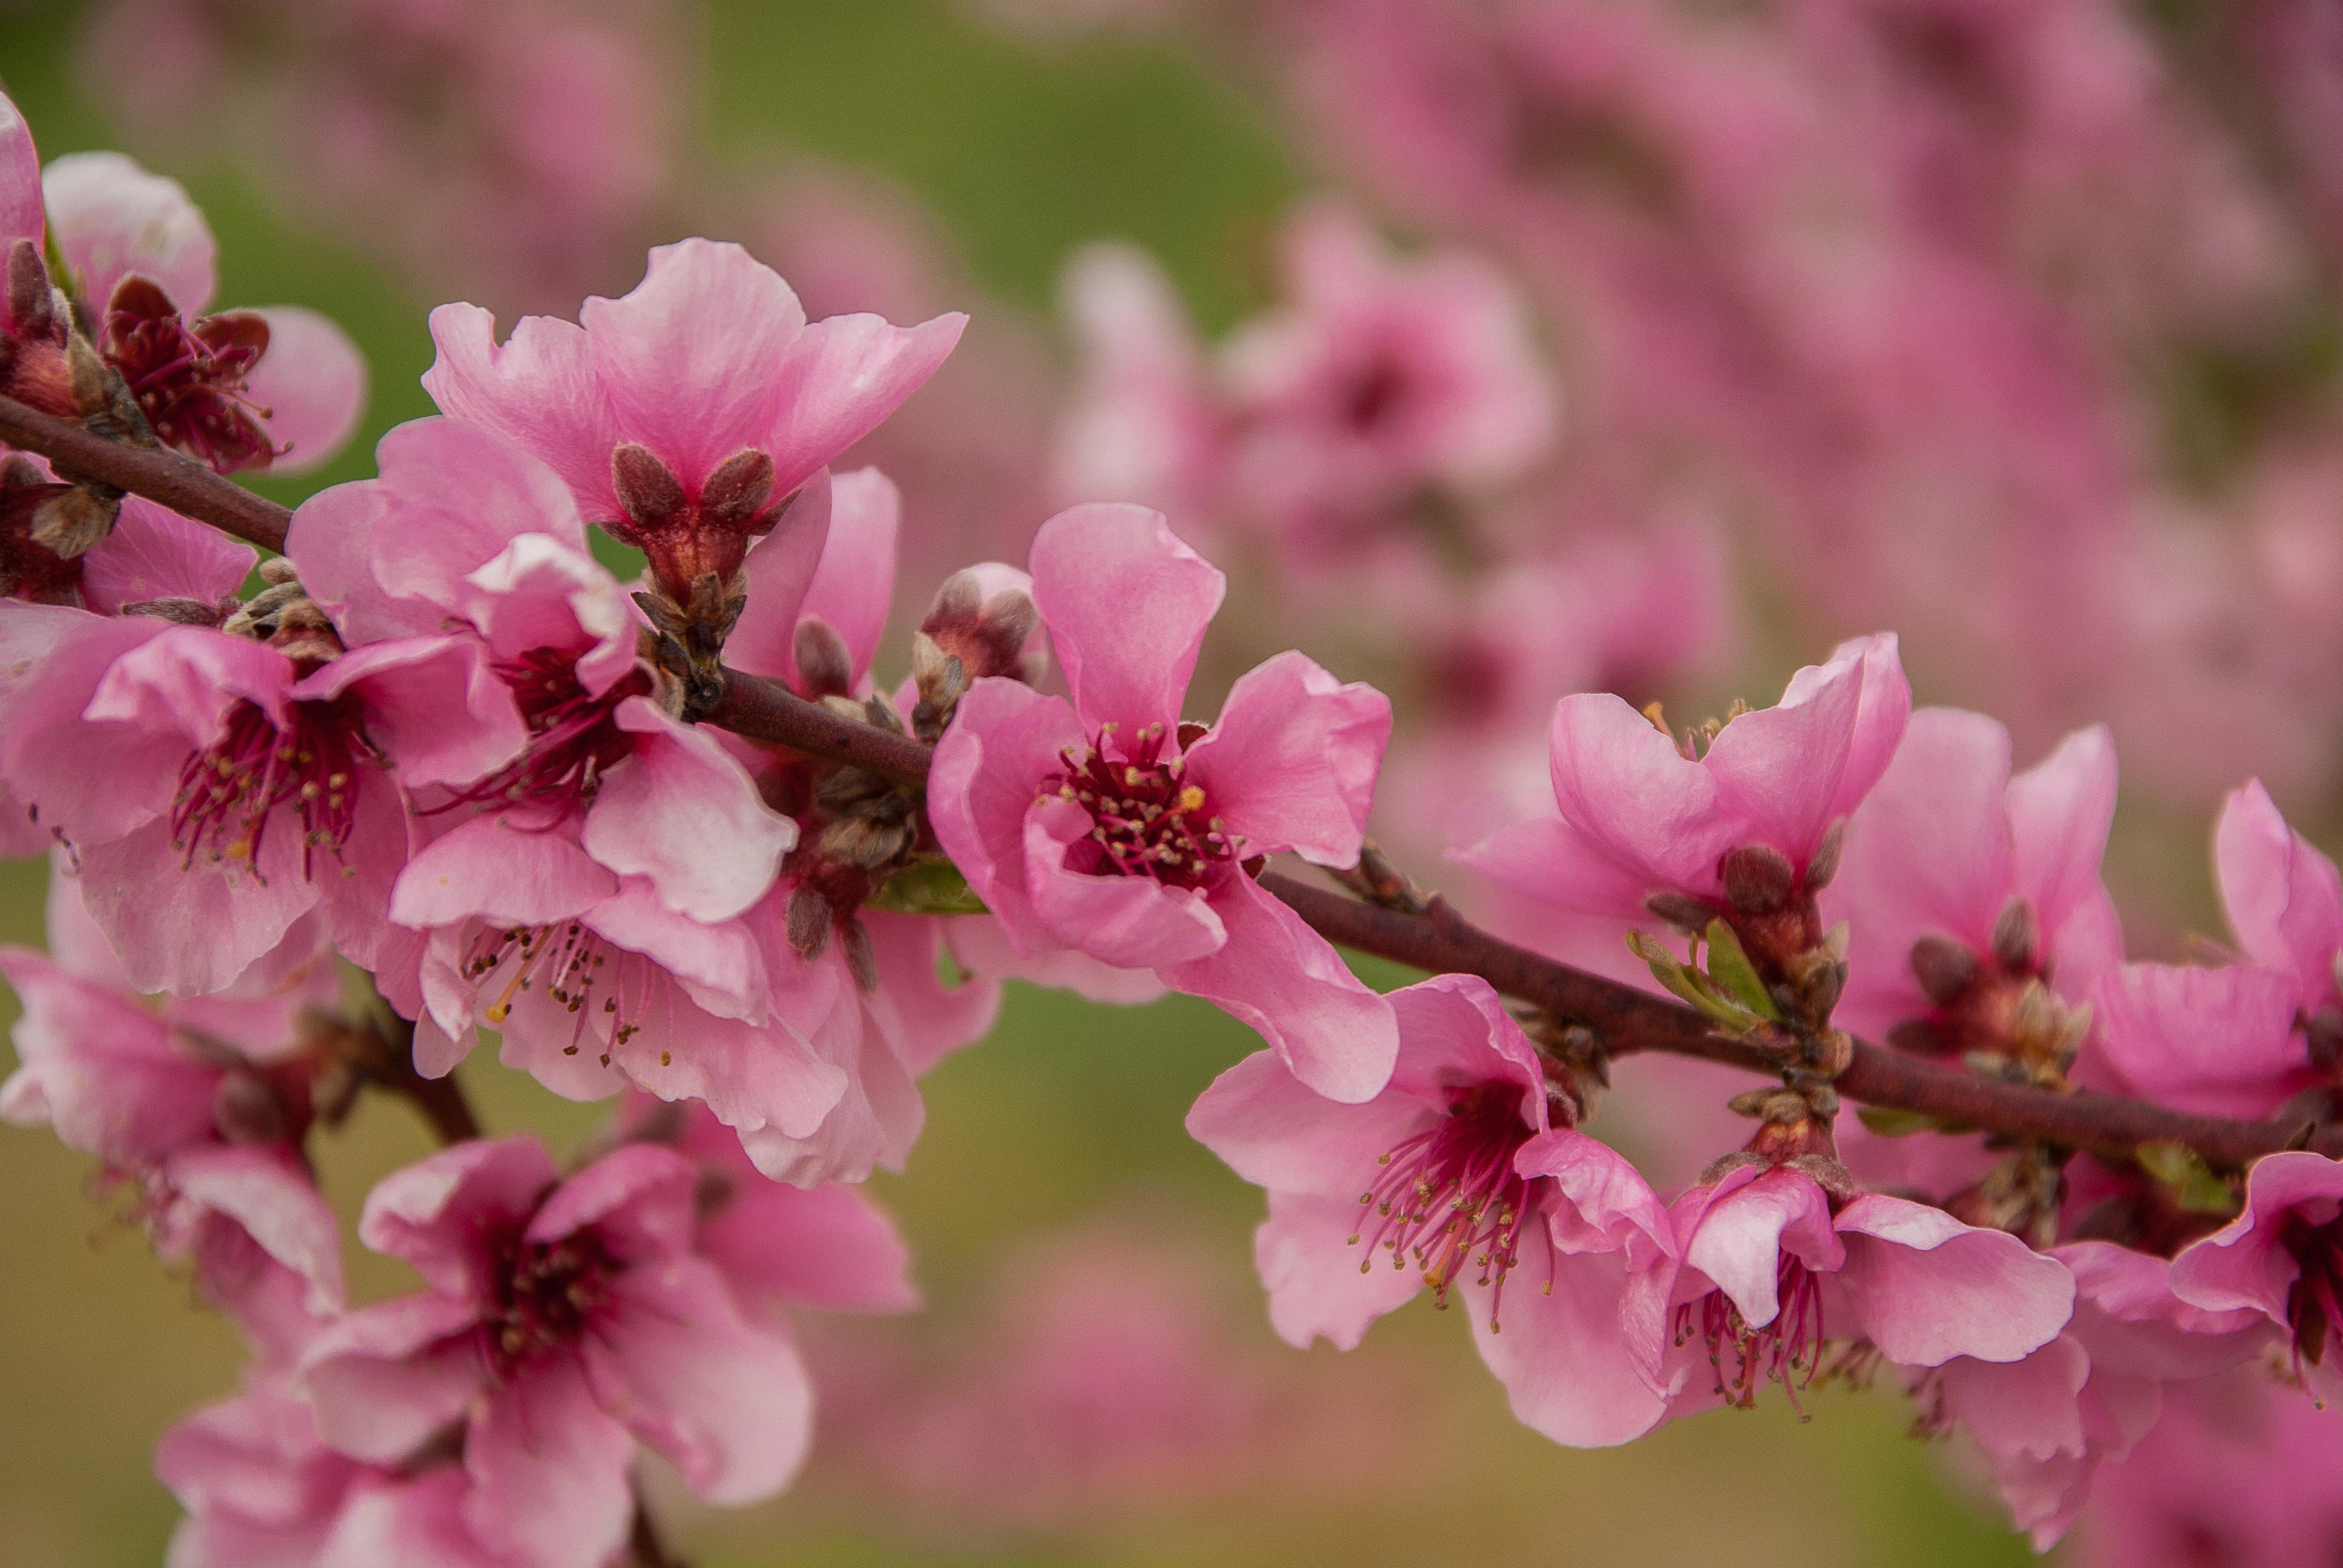 Free Images Branch Flower Petal Food Spring Produce Botany